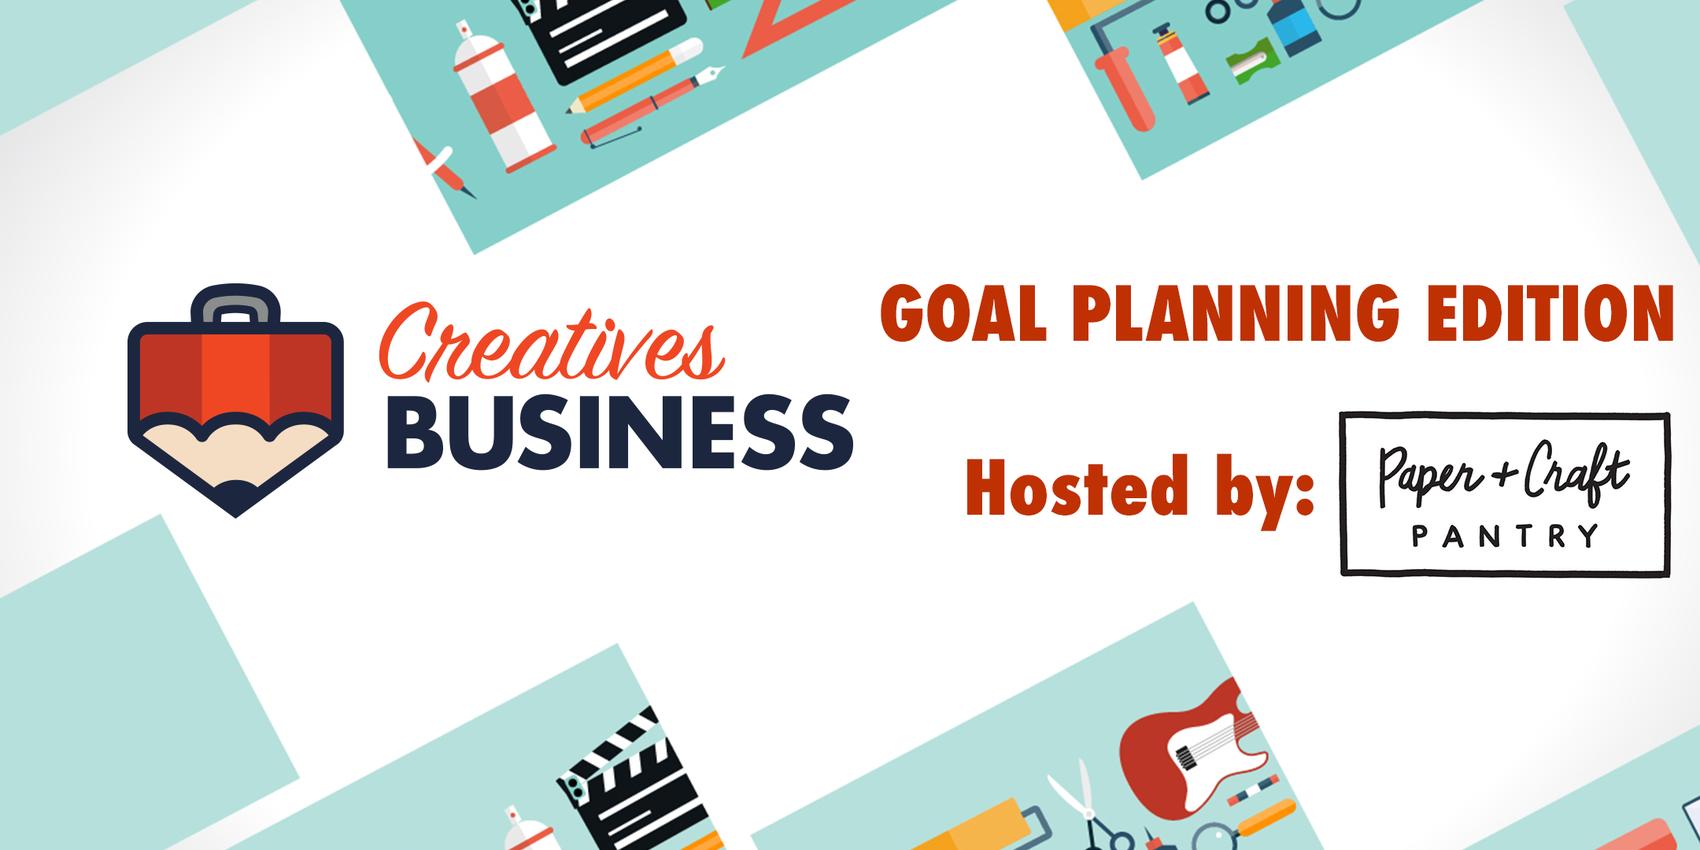 eventbrite-header_goal-planning-edition_xl.png